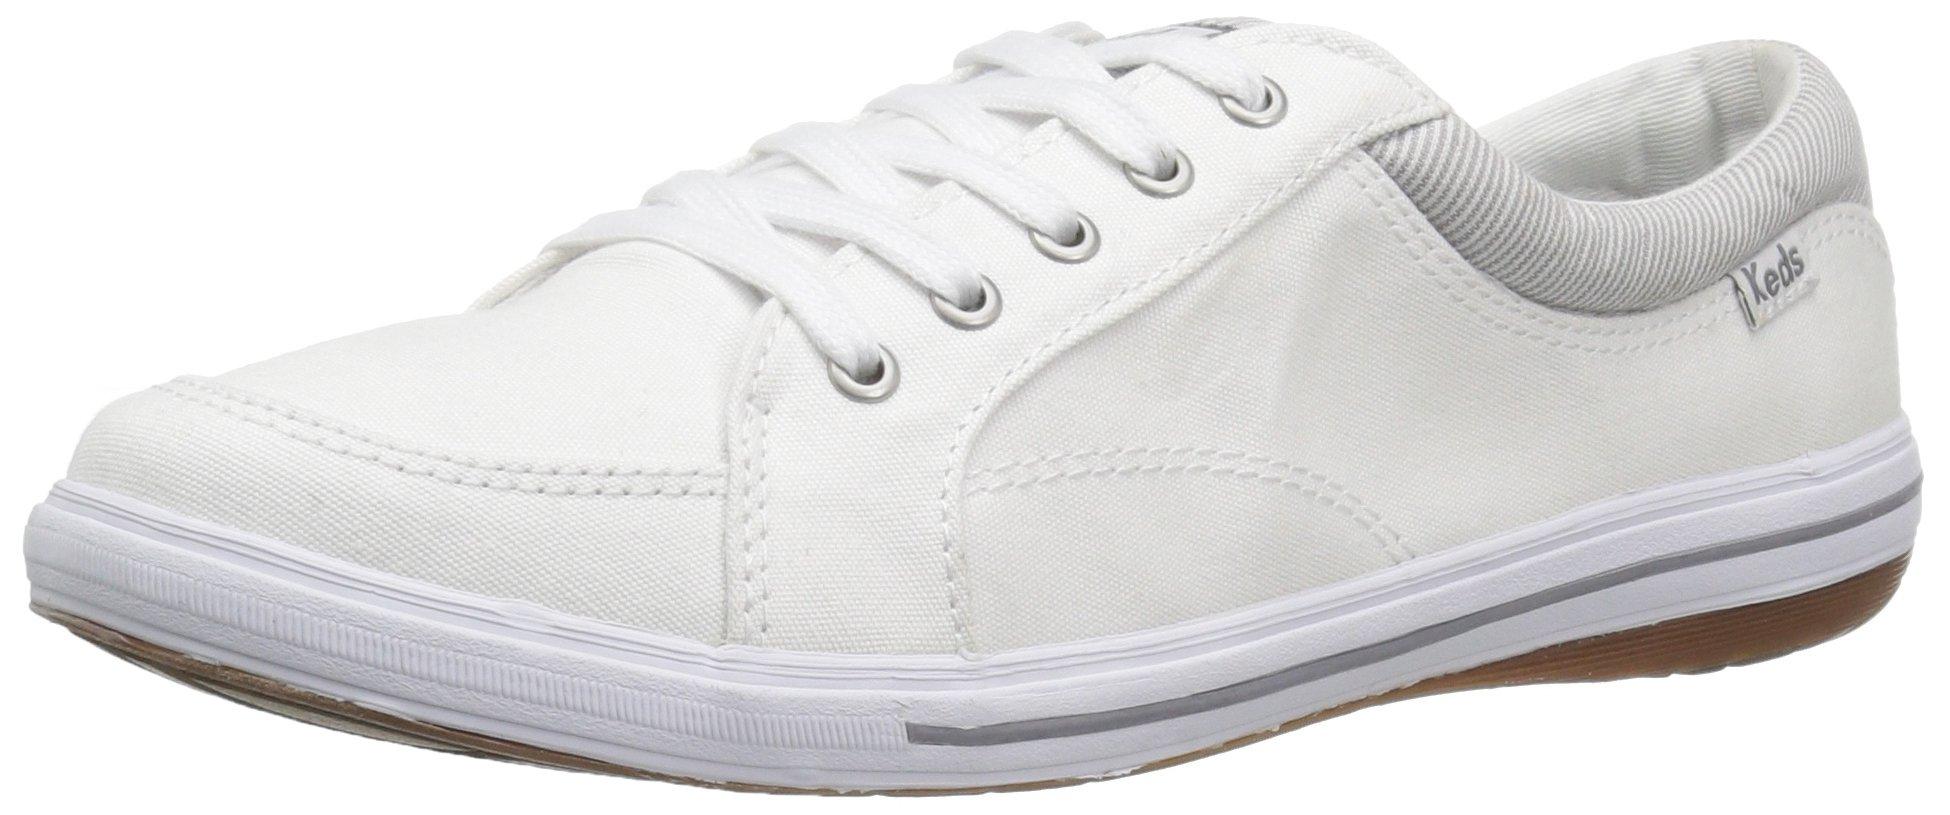 Keds Women's Vollie Chambray Fashion Sneaker, White, 6 M US